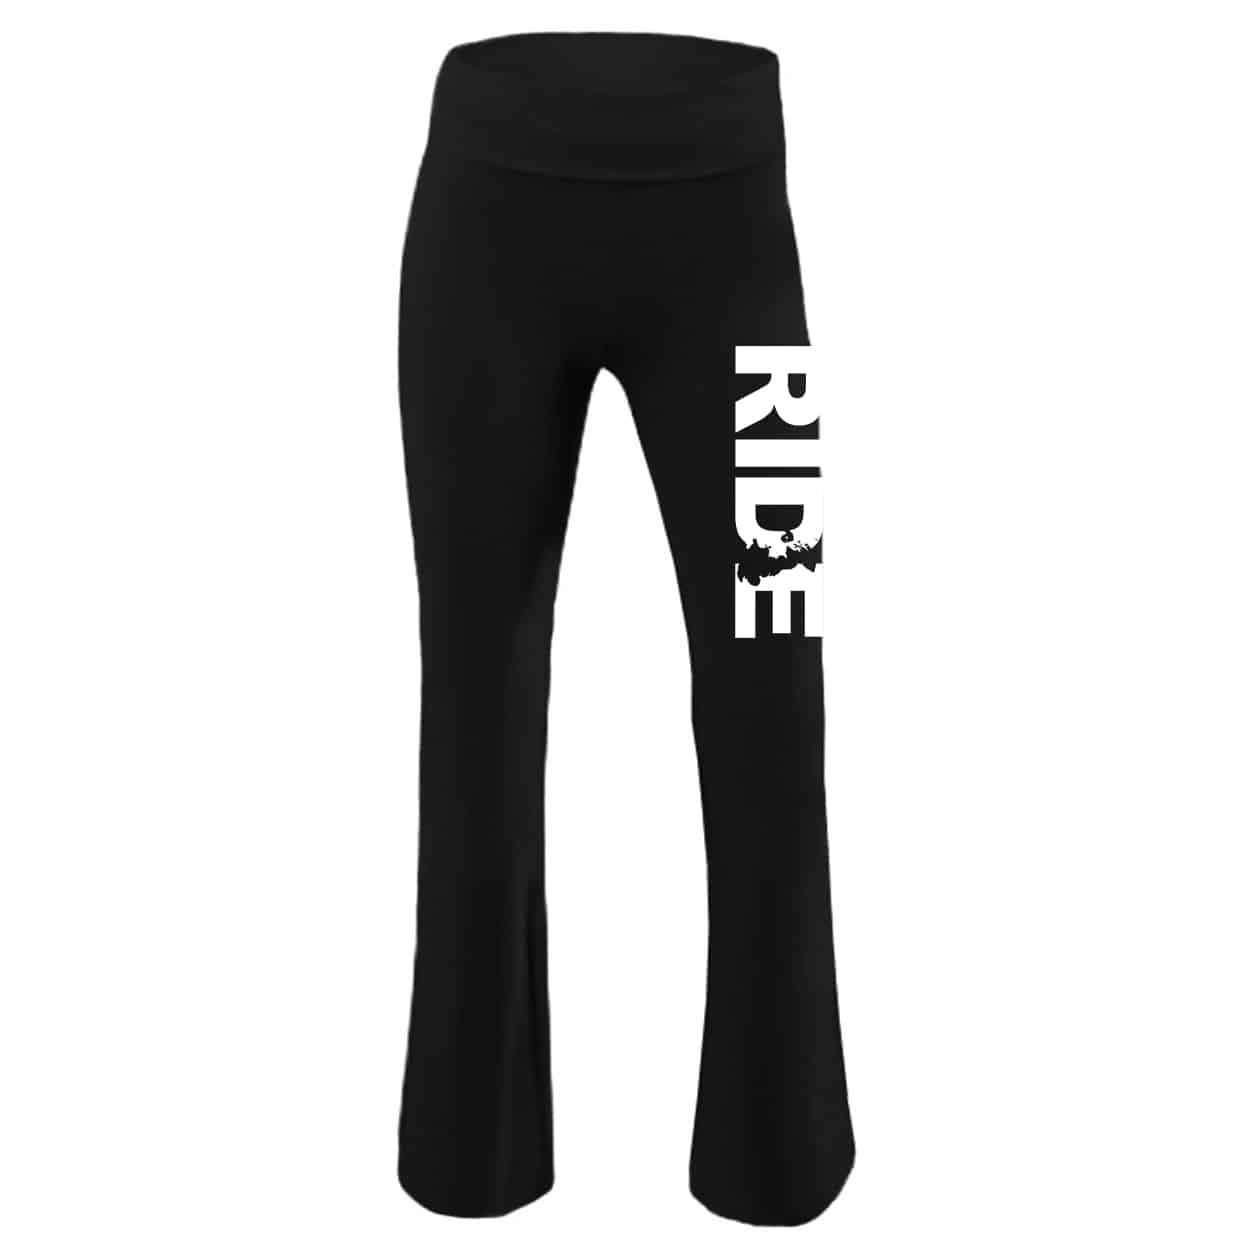 Ride United Kingdom Classic Youth Girls Yoga Pants Black (White Logo)